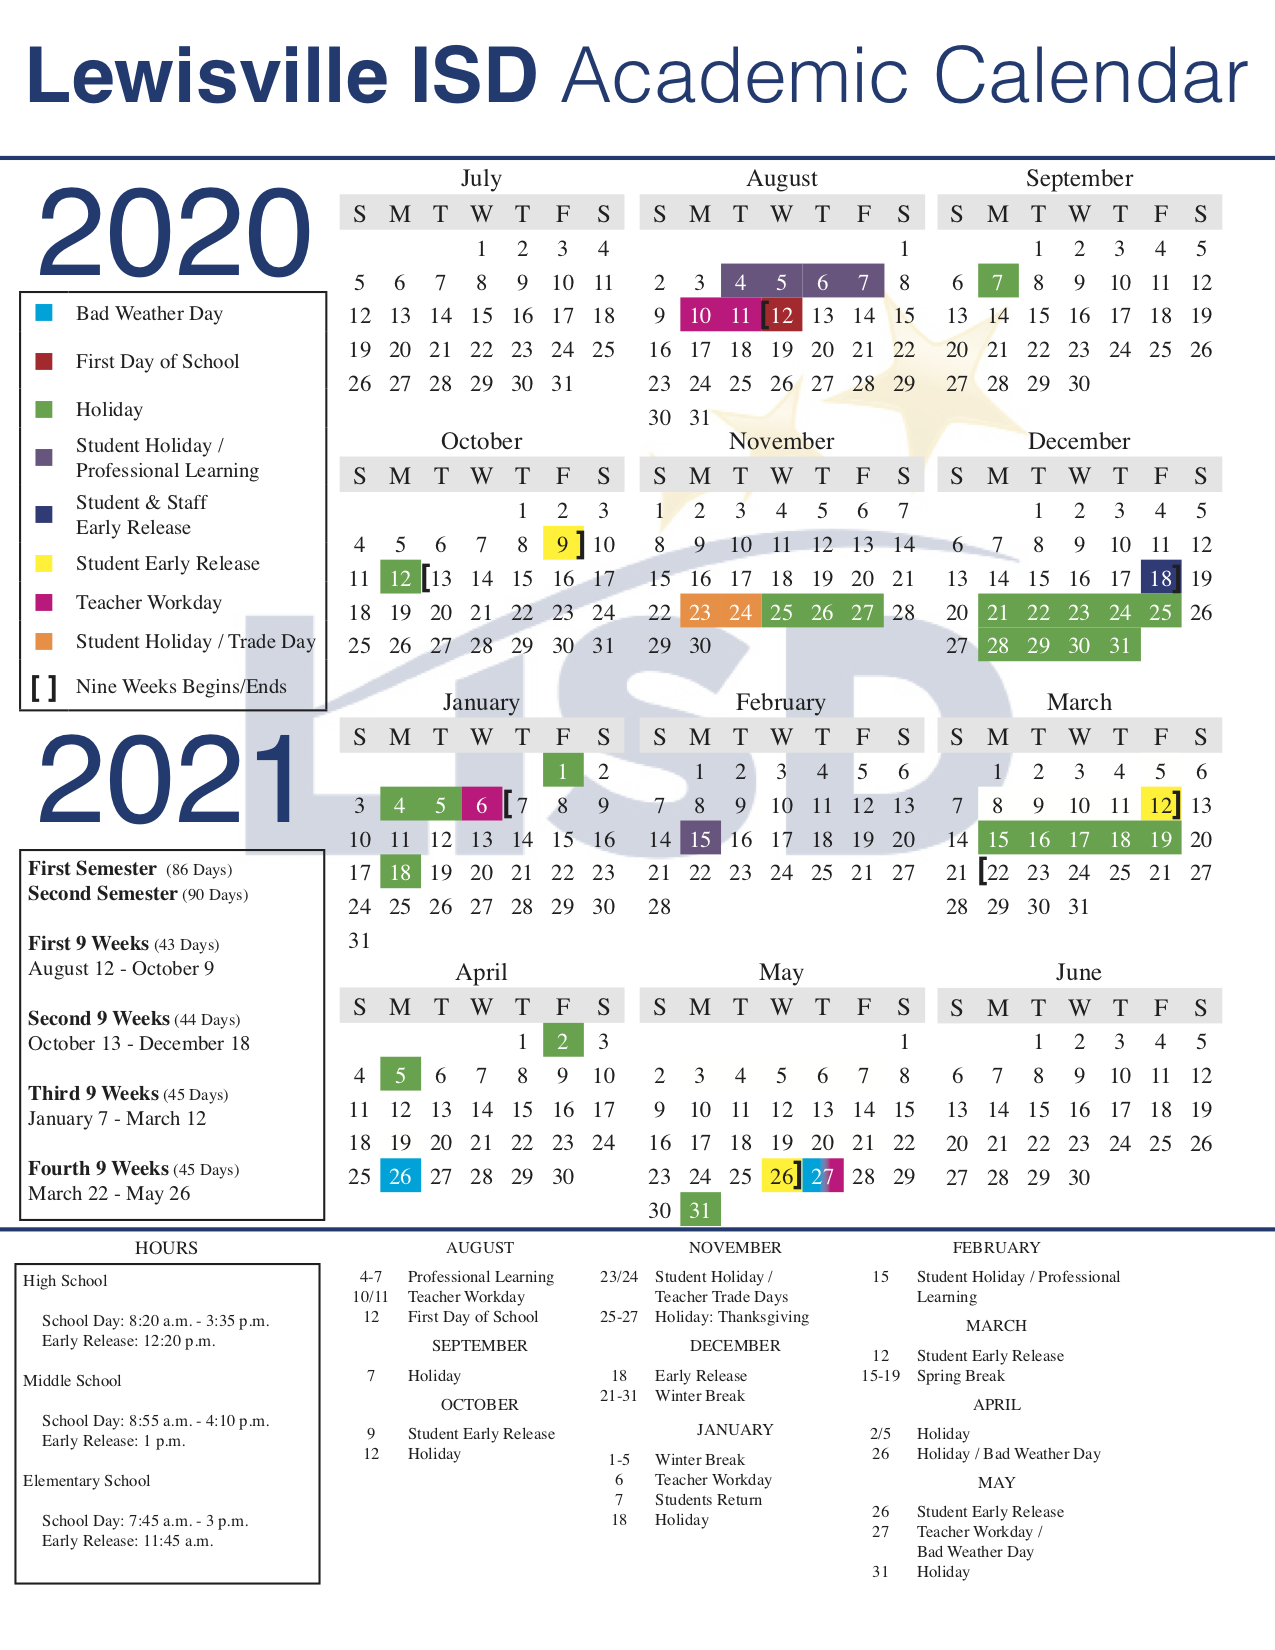 Leap Year Julian Calendar   Printable Calendar 2020 2021 Inside Collin College School Calendar